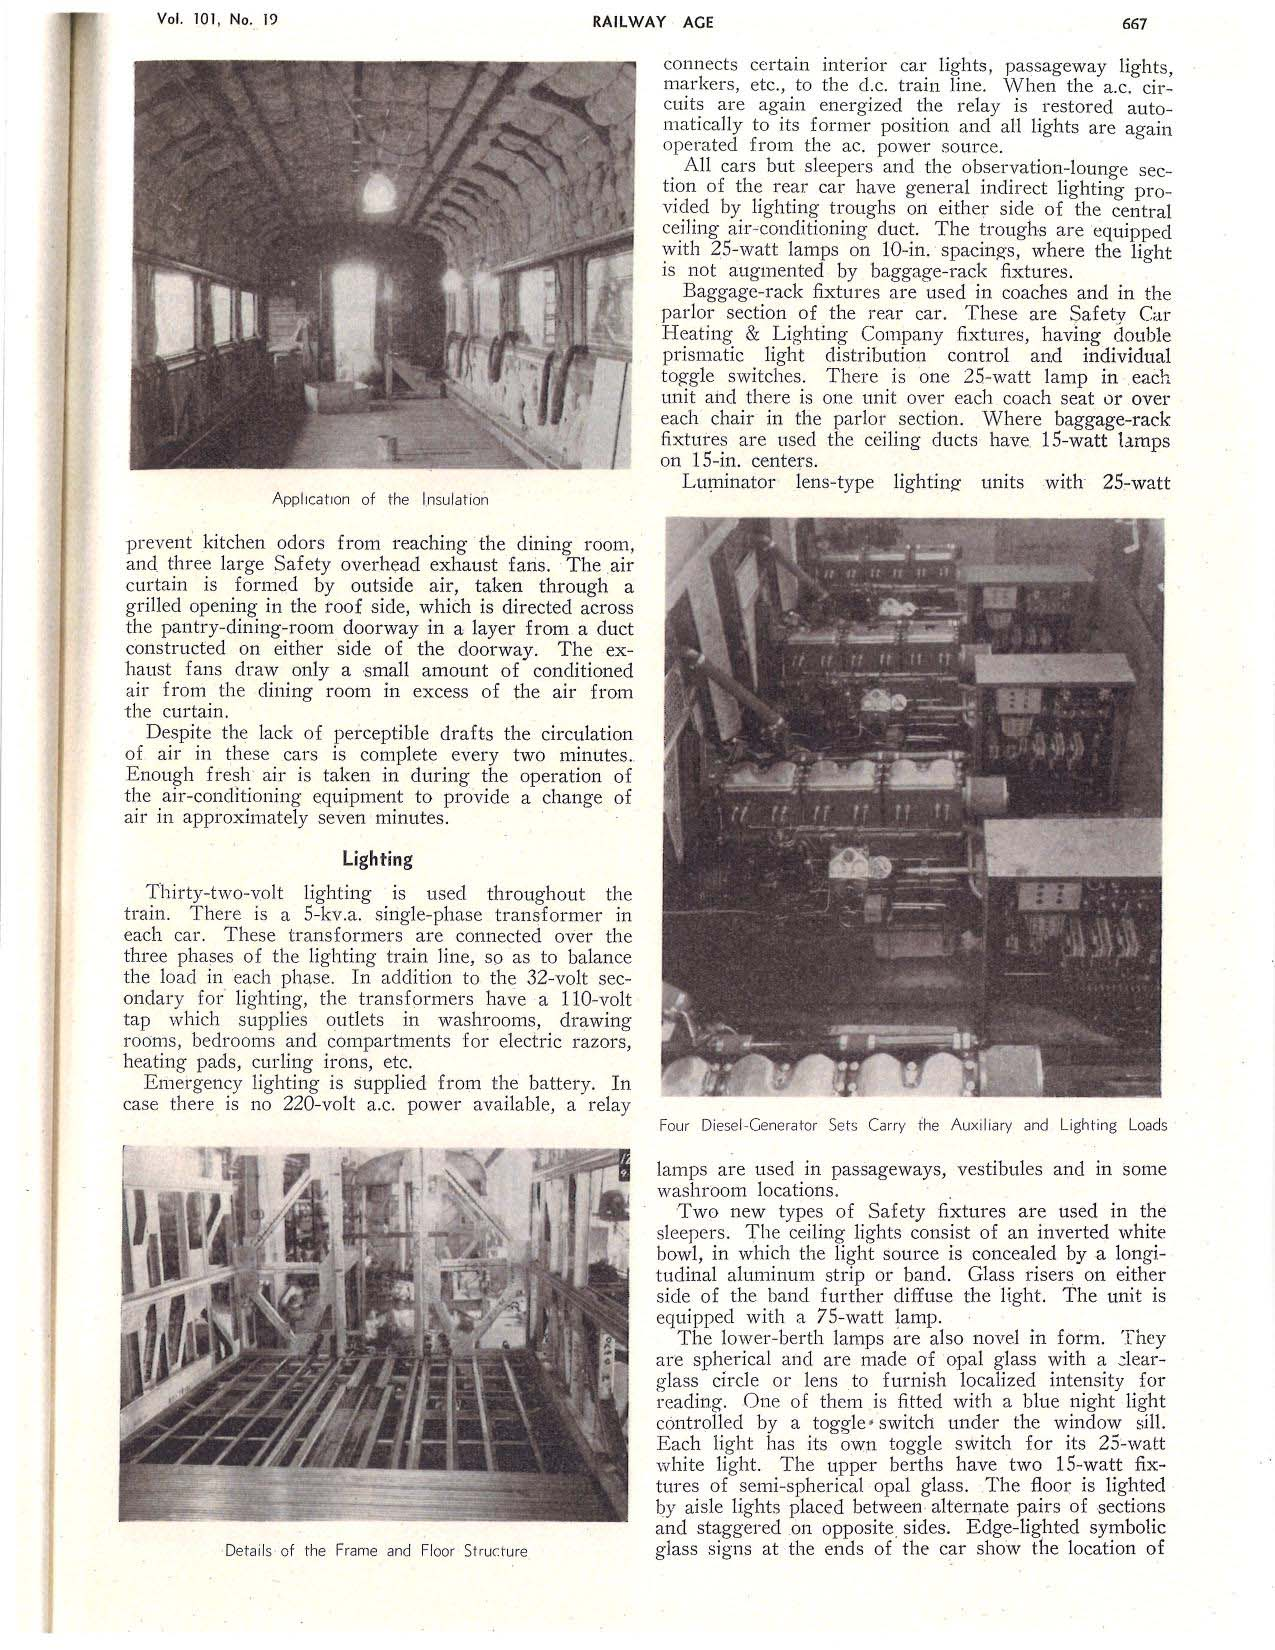 1936+Railway+Age+Article+-+Compressed 10.jpg